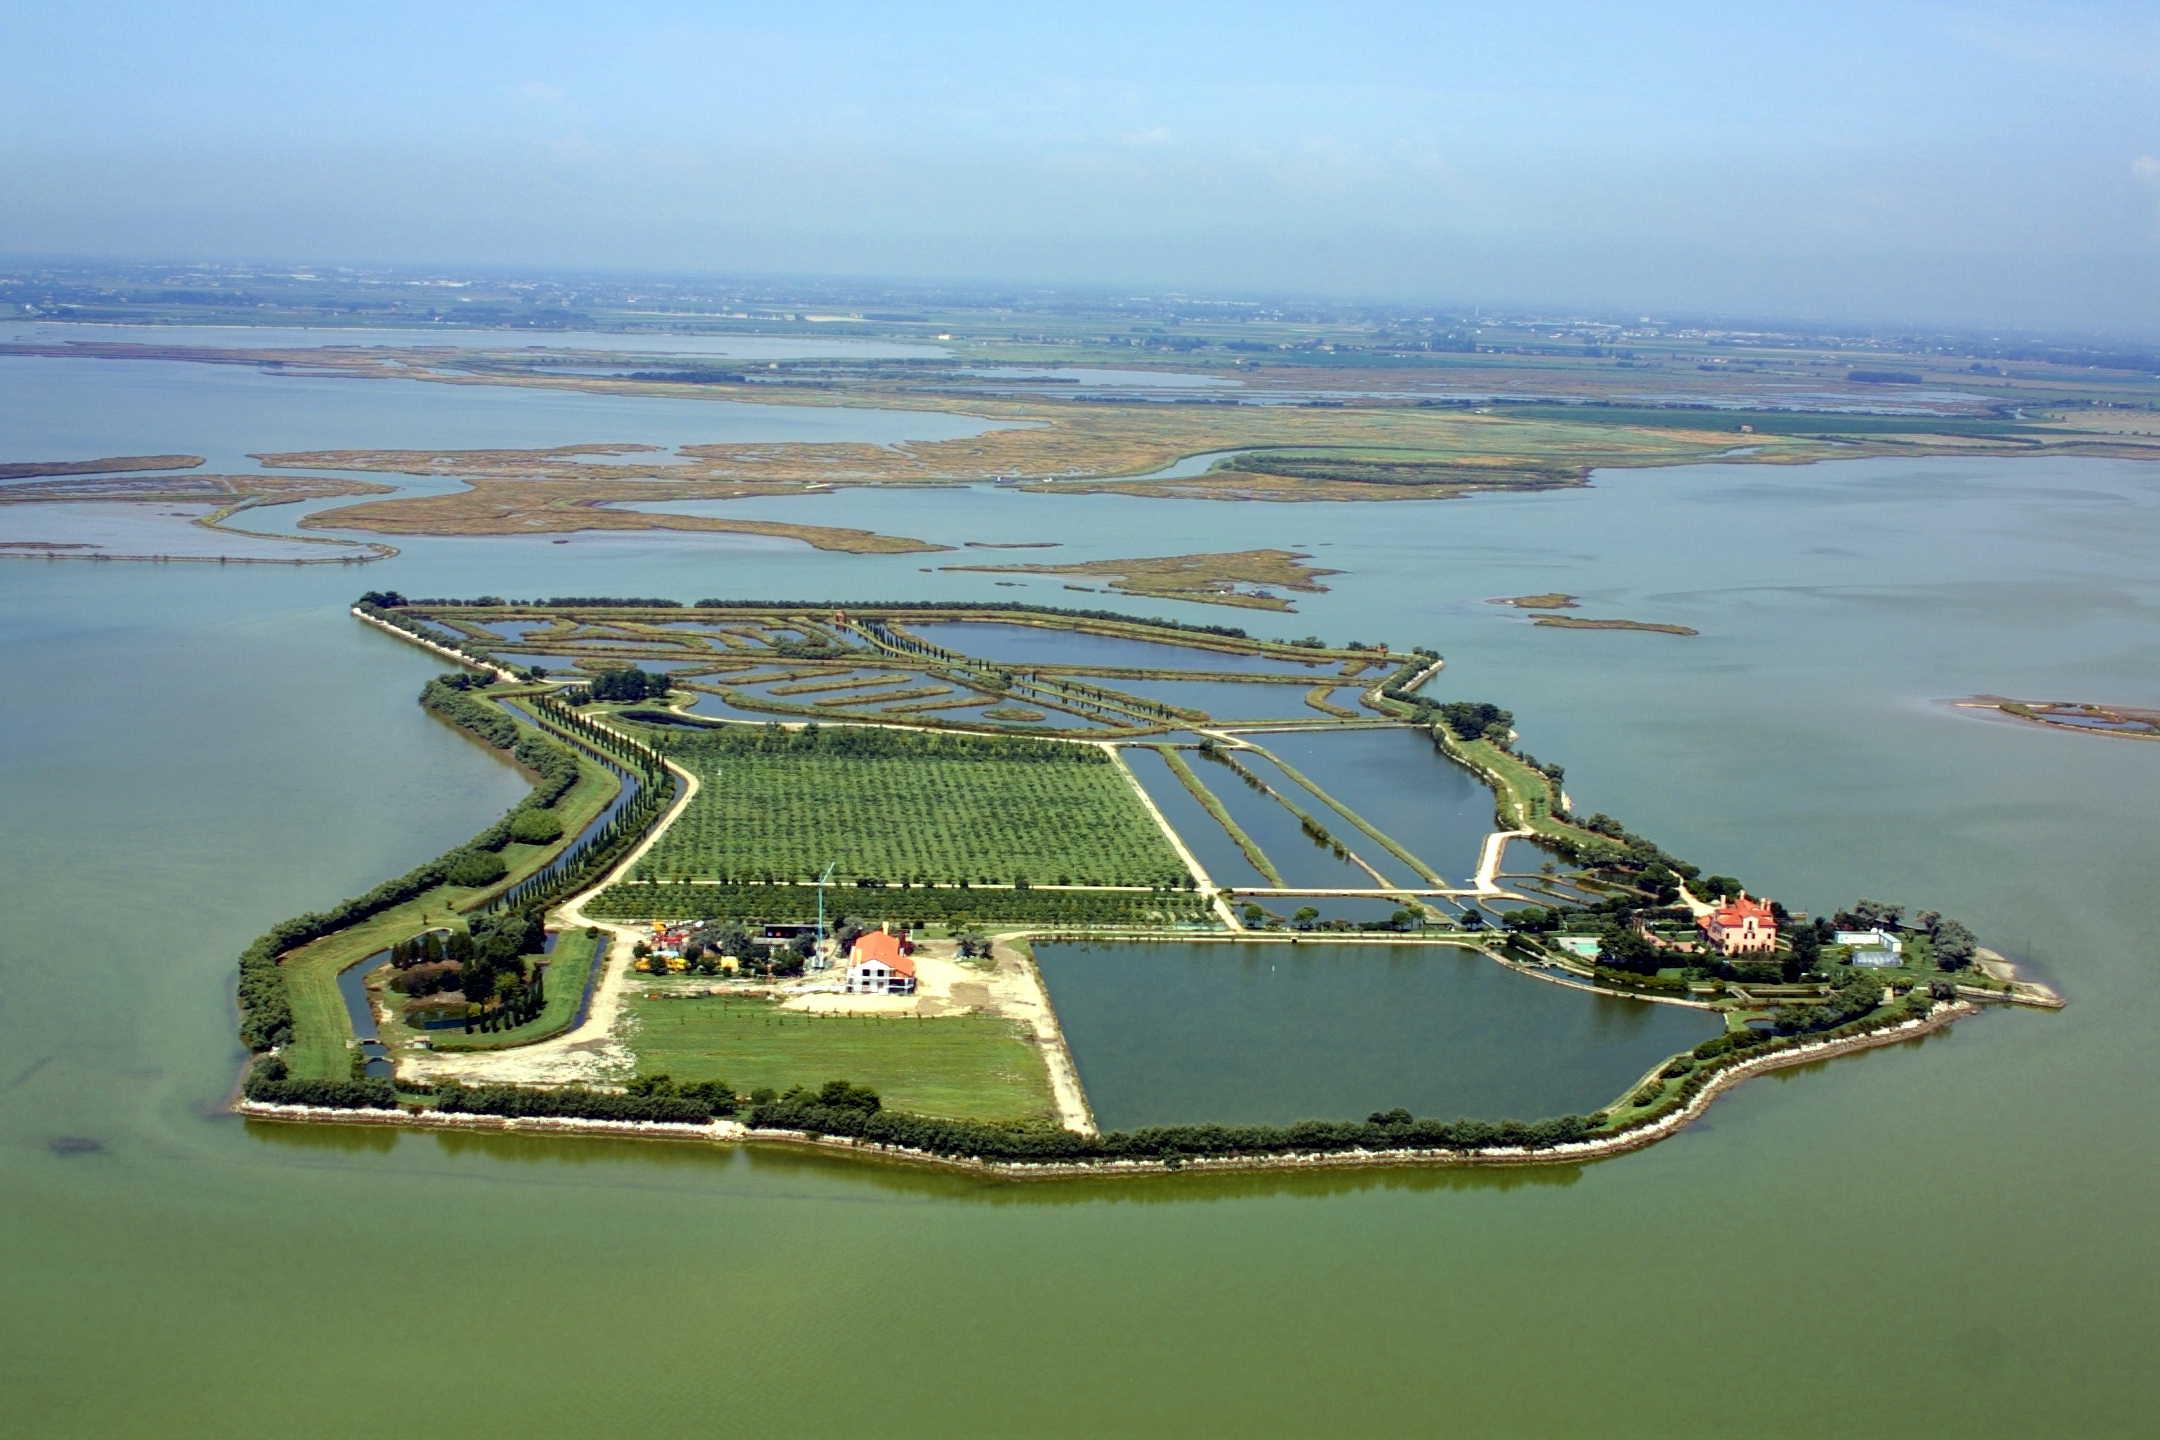 Foto panoramica Isola Santa Cristina, Laguna Nord di Venezia